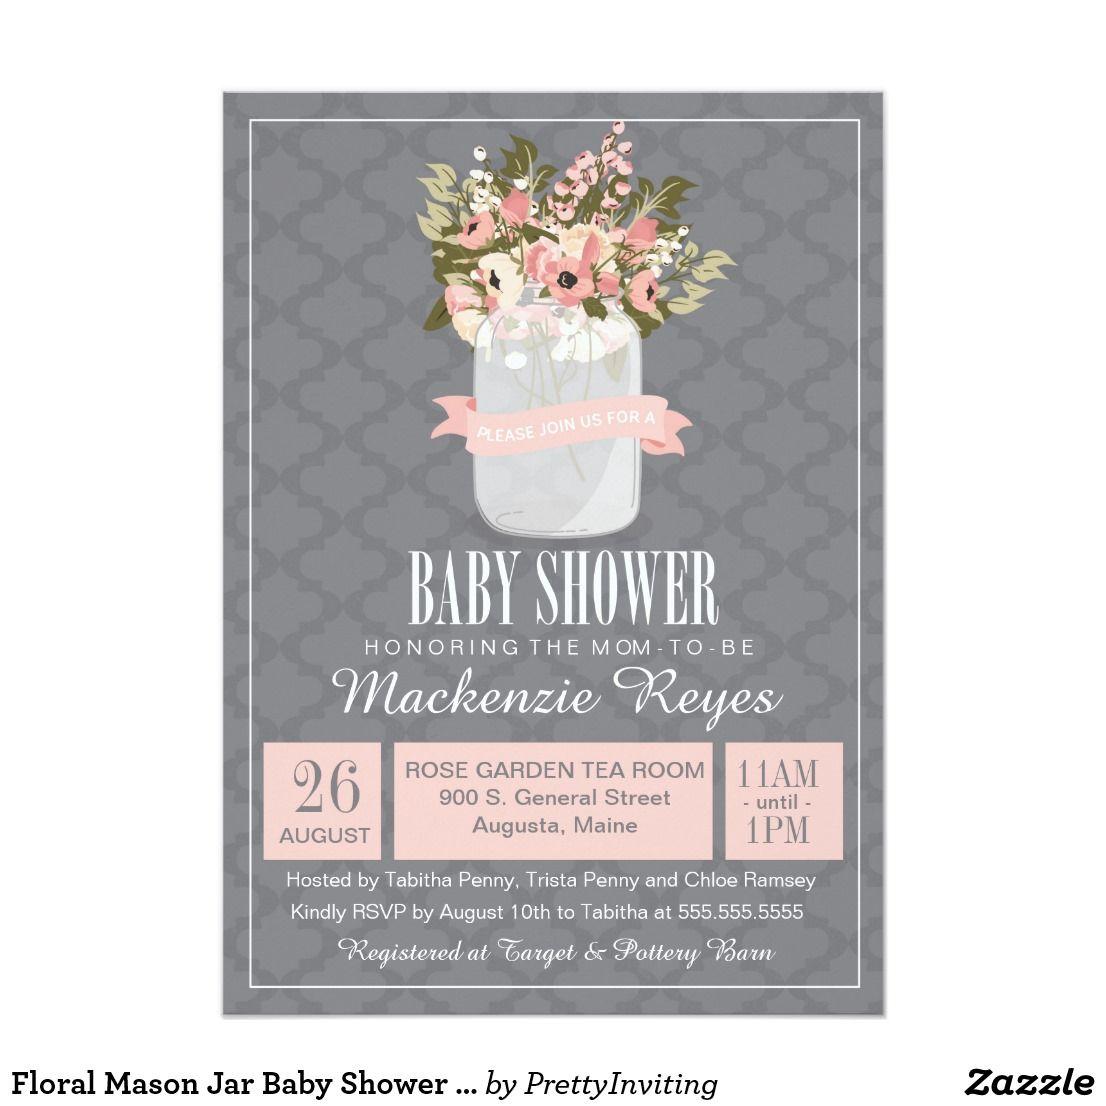 Floral Mason Jar Baby Shower Invitation | Shower invitations